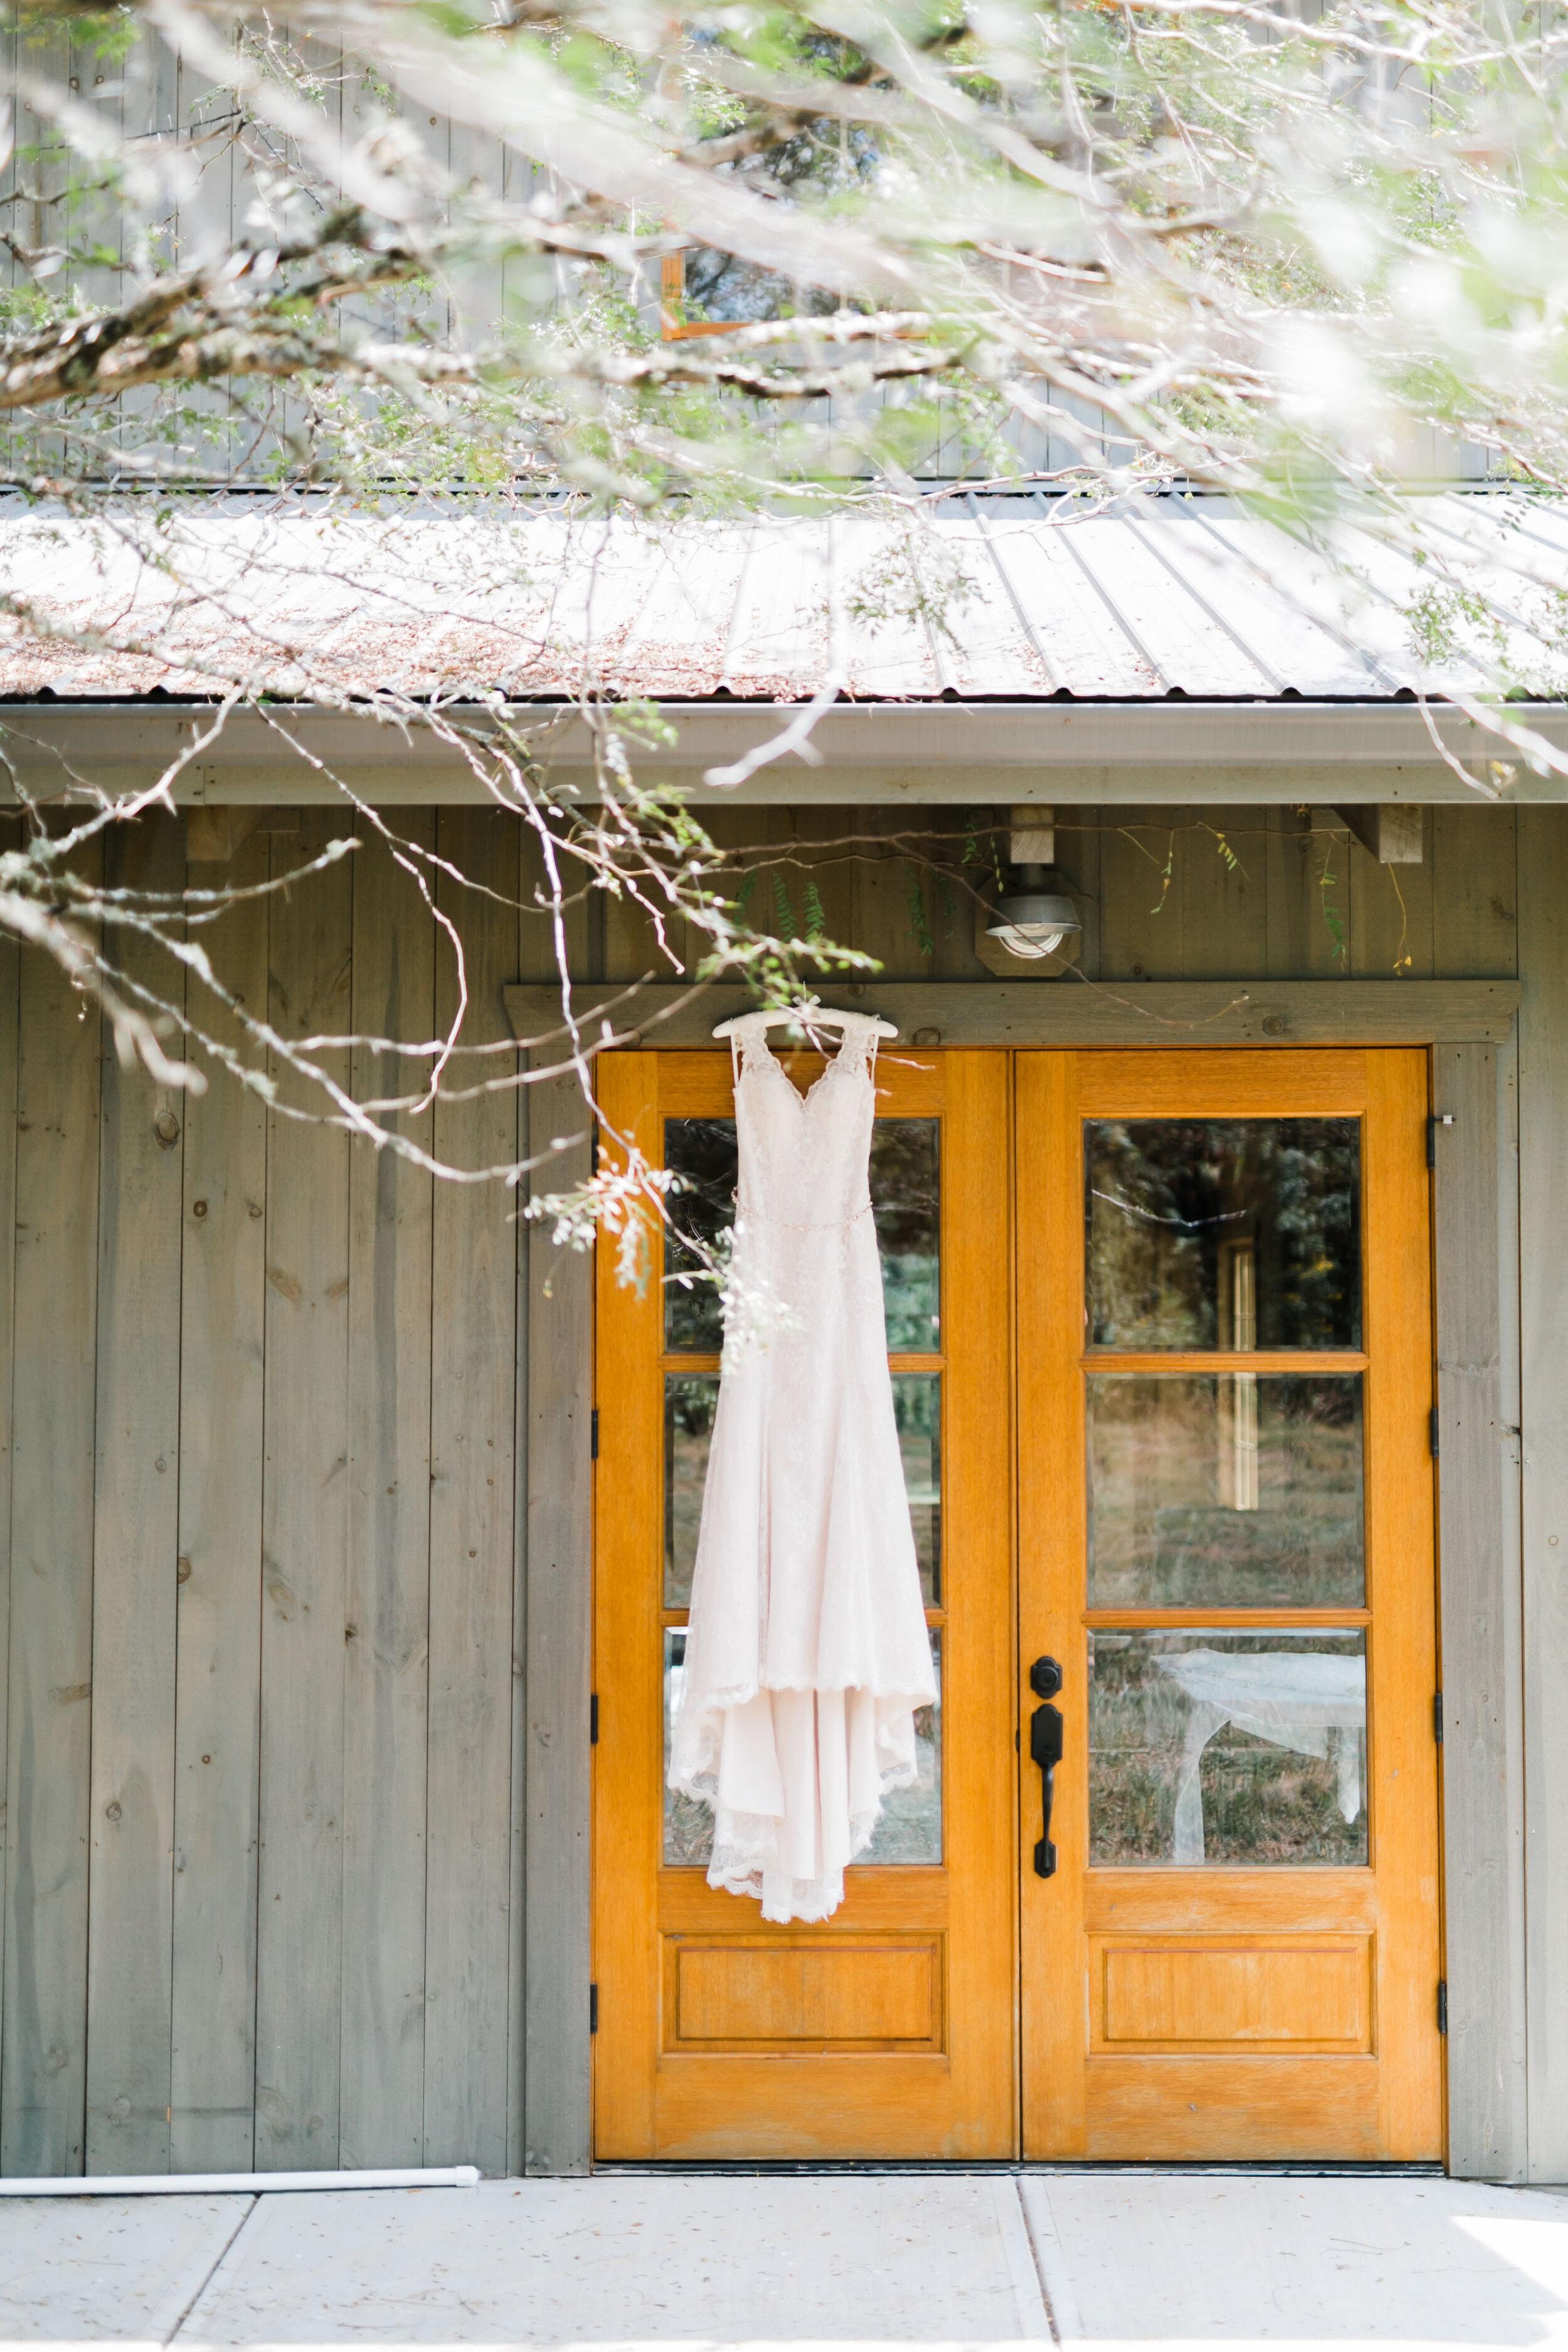 dress hanging 4 points farm wedding